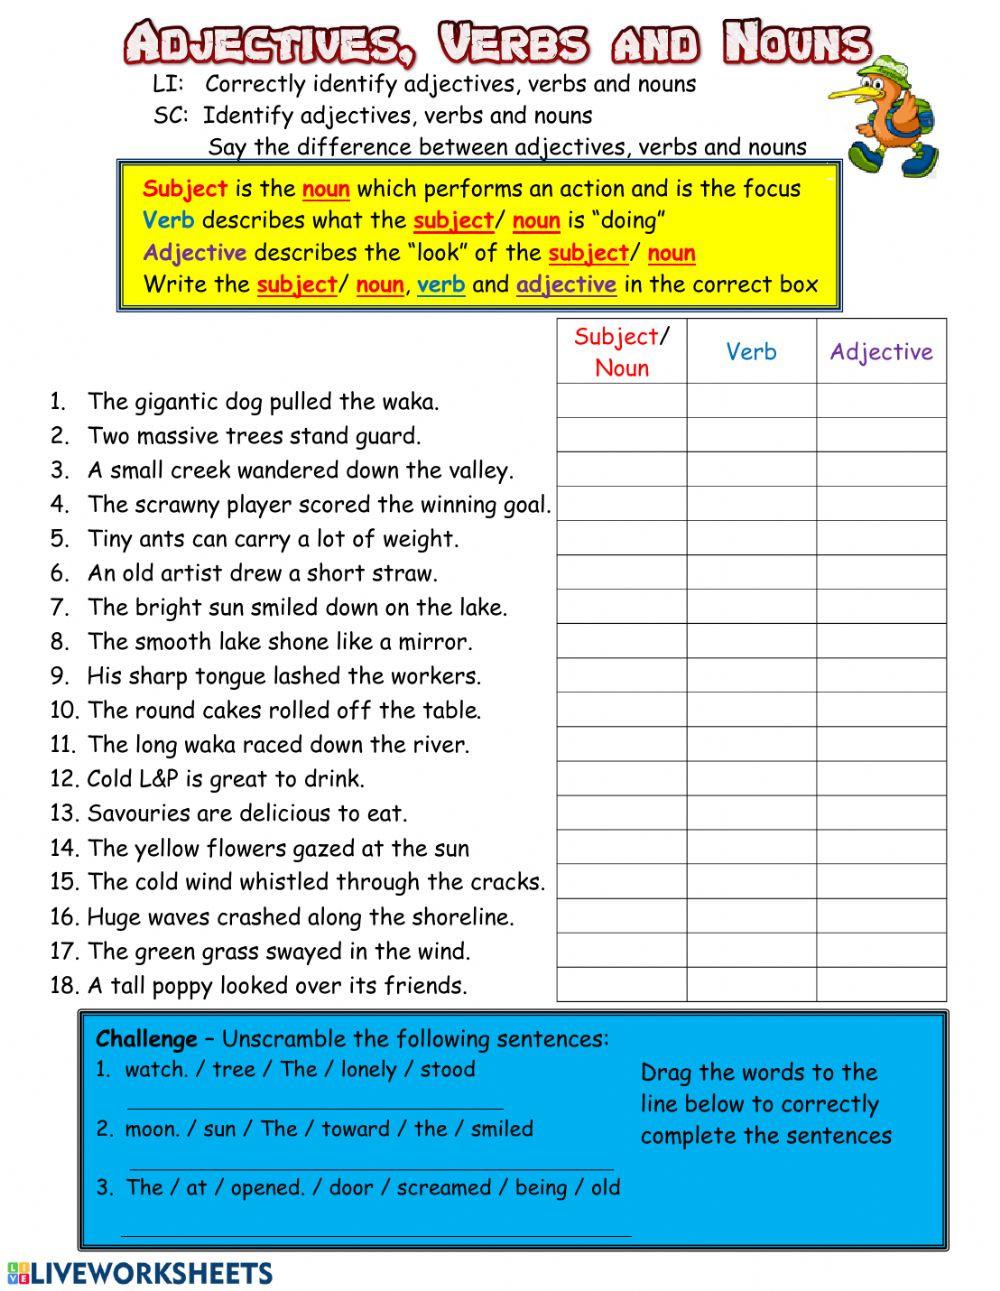 Noun Verb Adjective Worksheet Adjectives Verbs and Nouns Interactive Worksheet